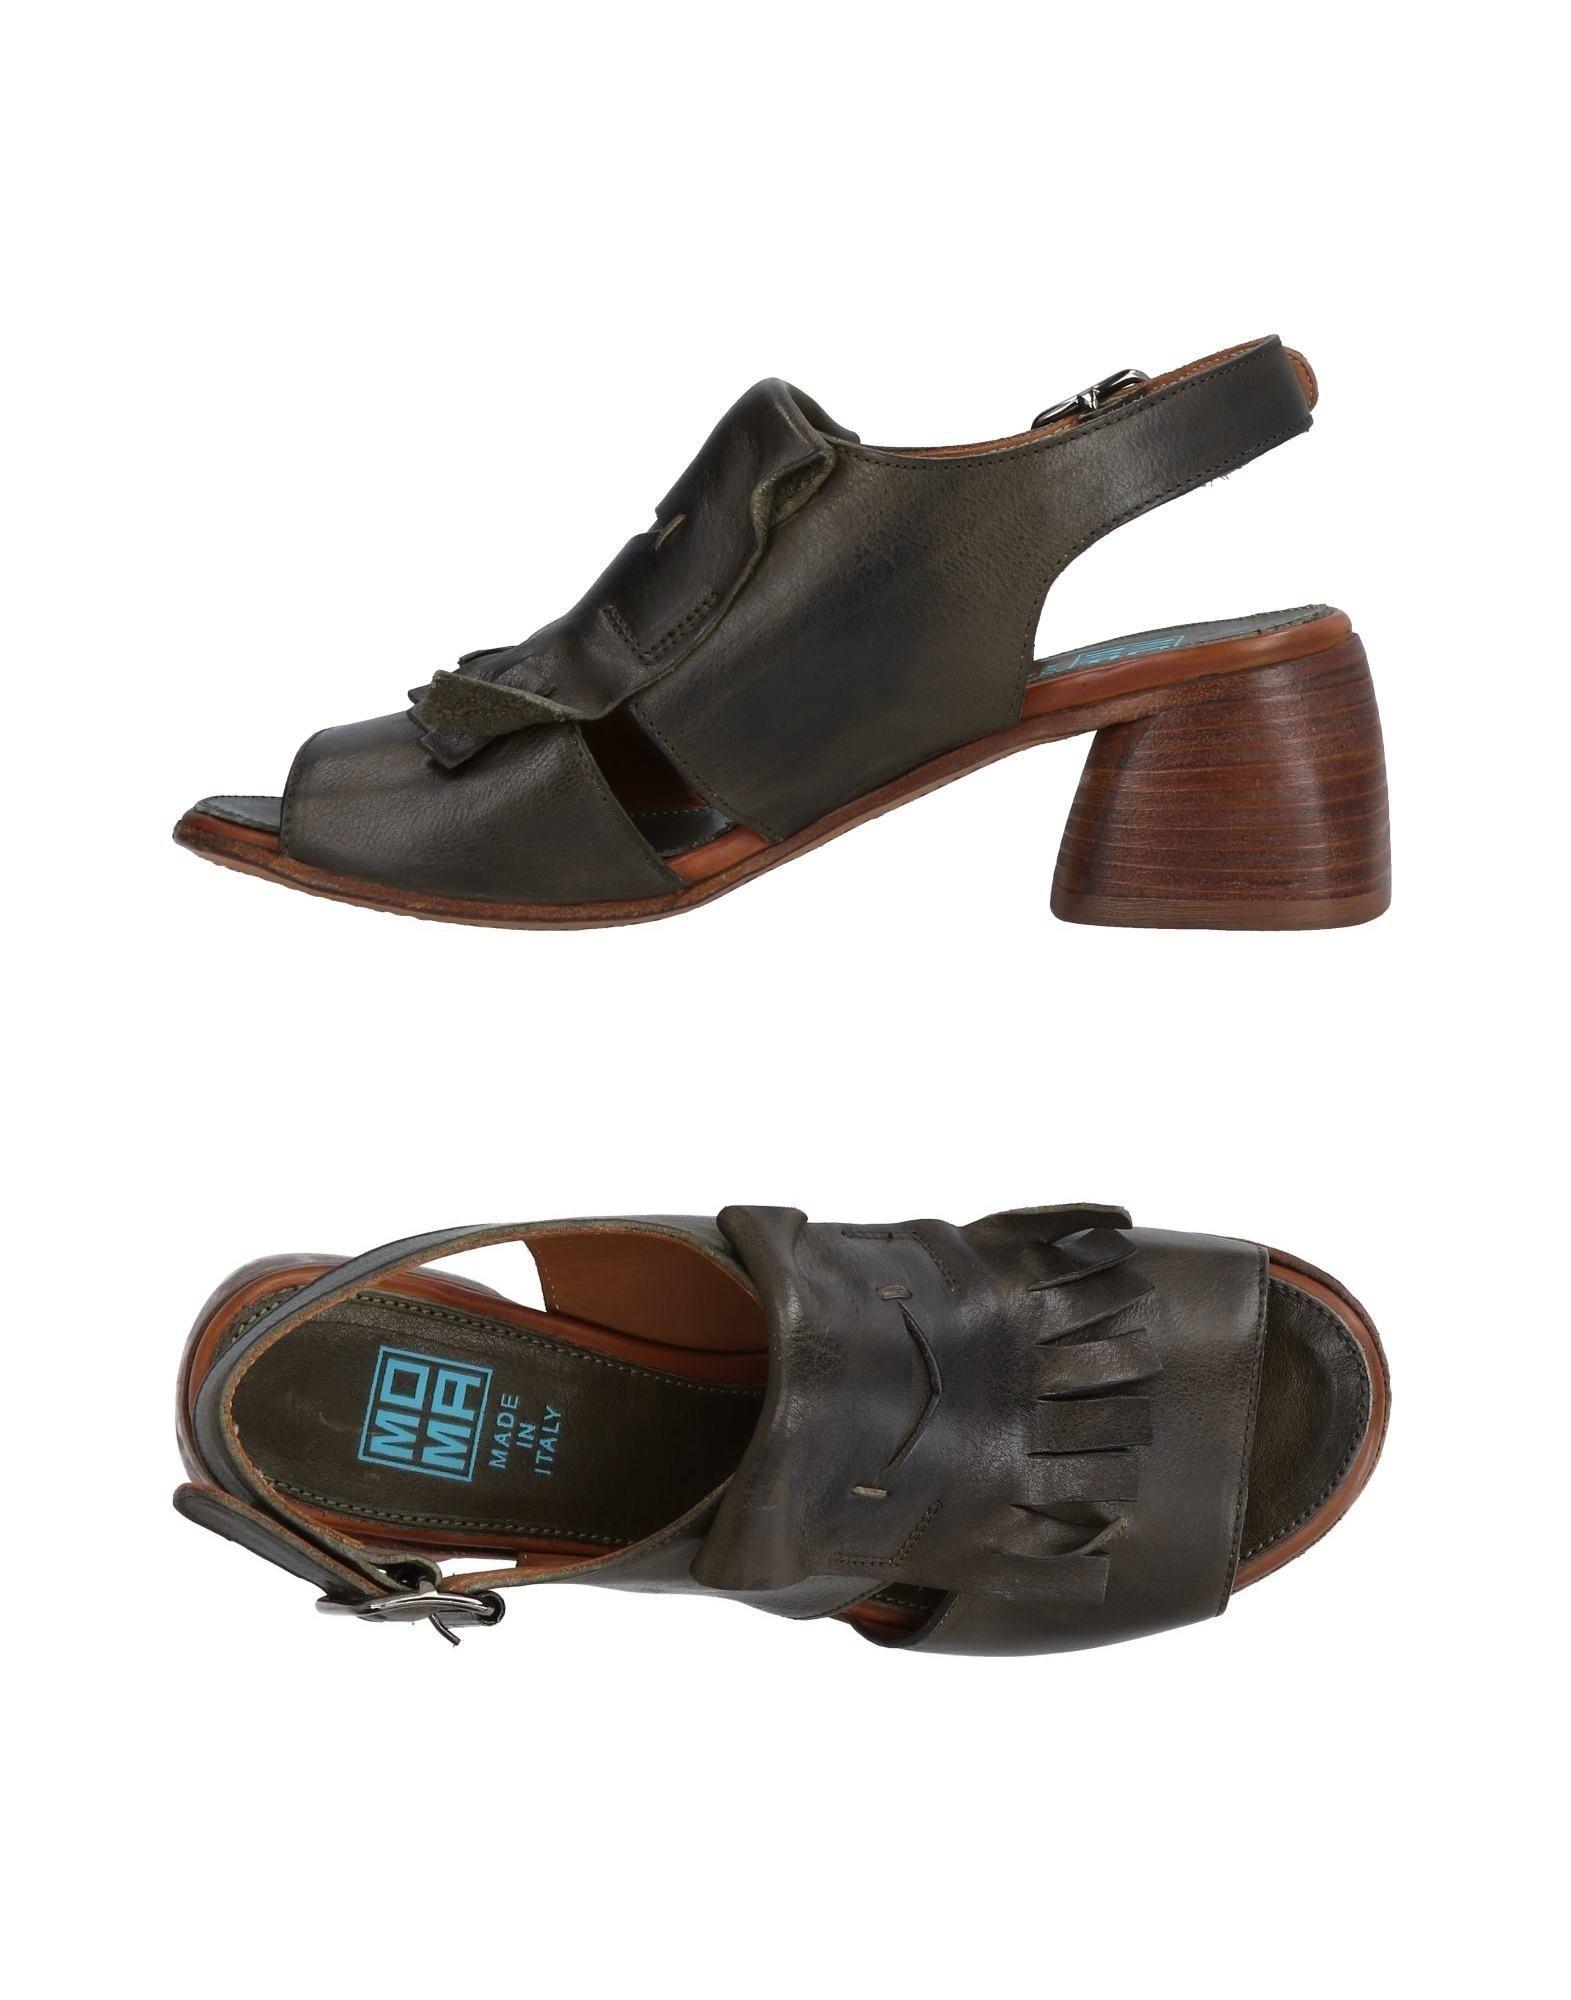 Moma Dark Green Leather Heeled Sandals